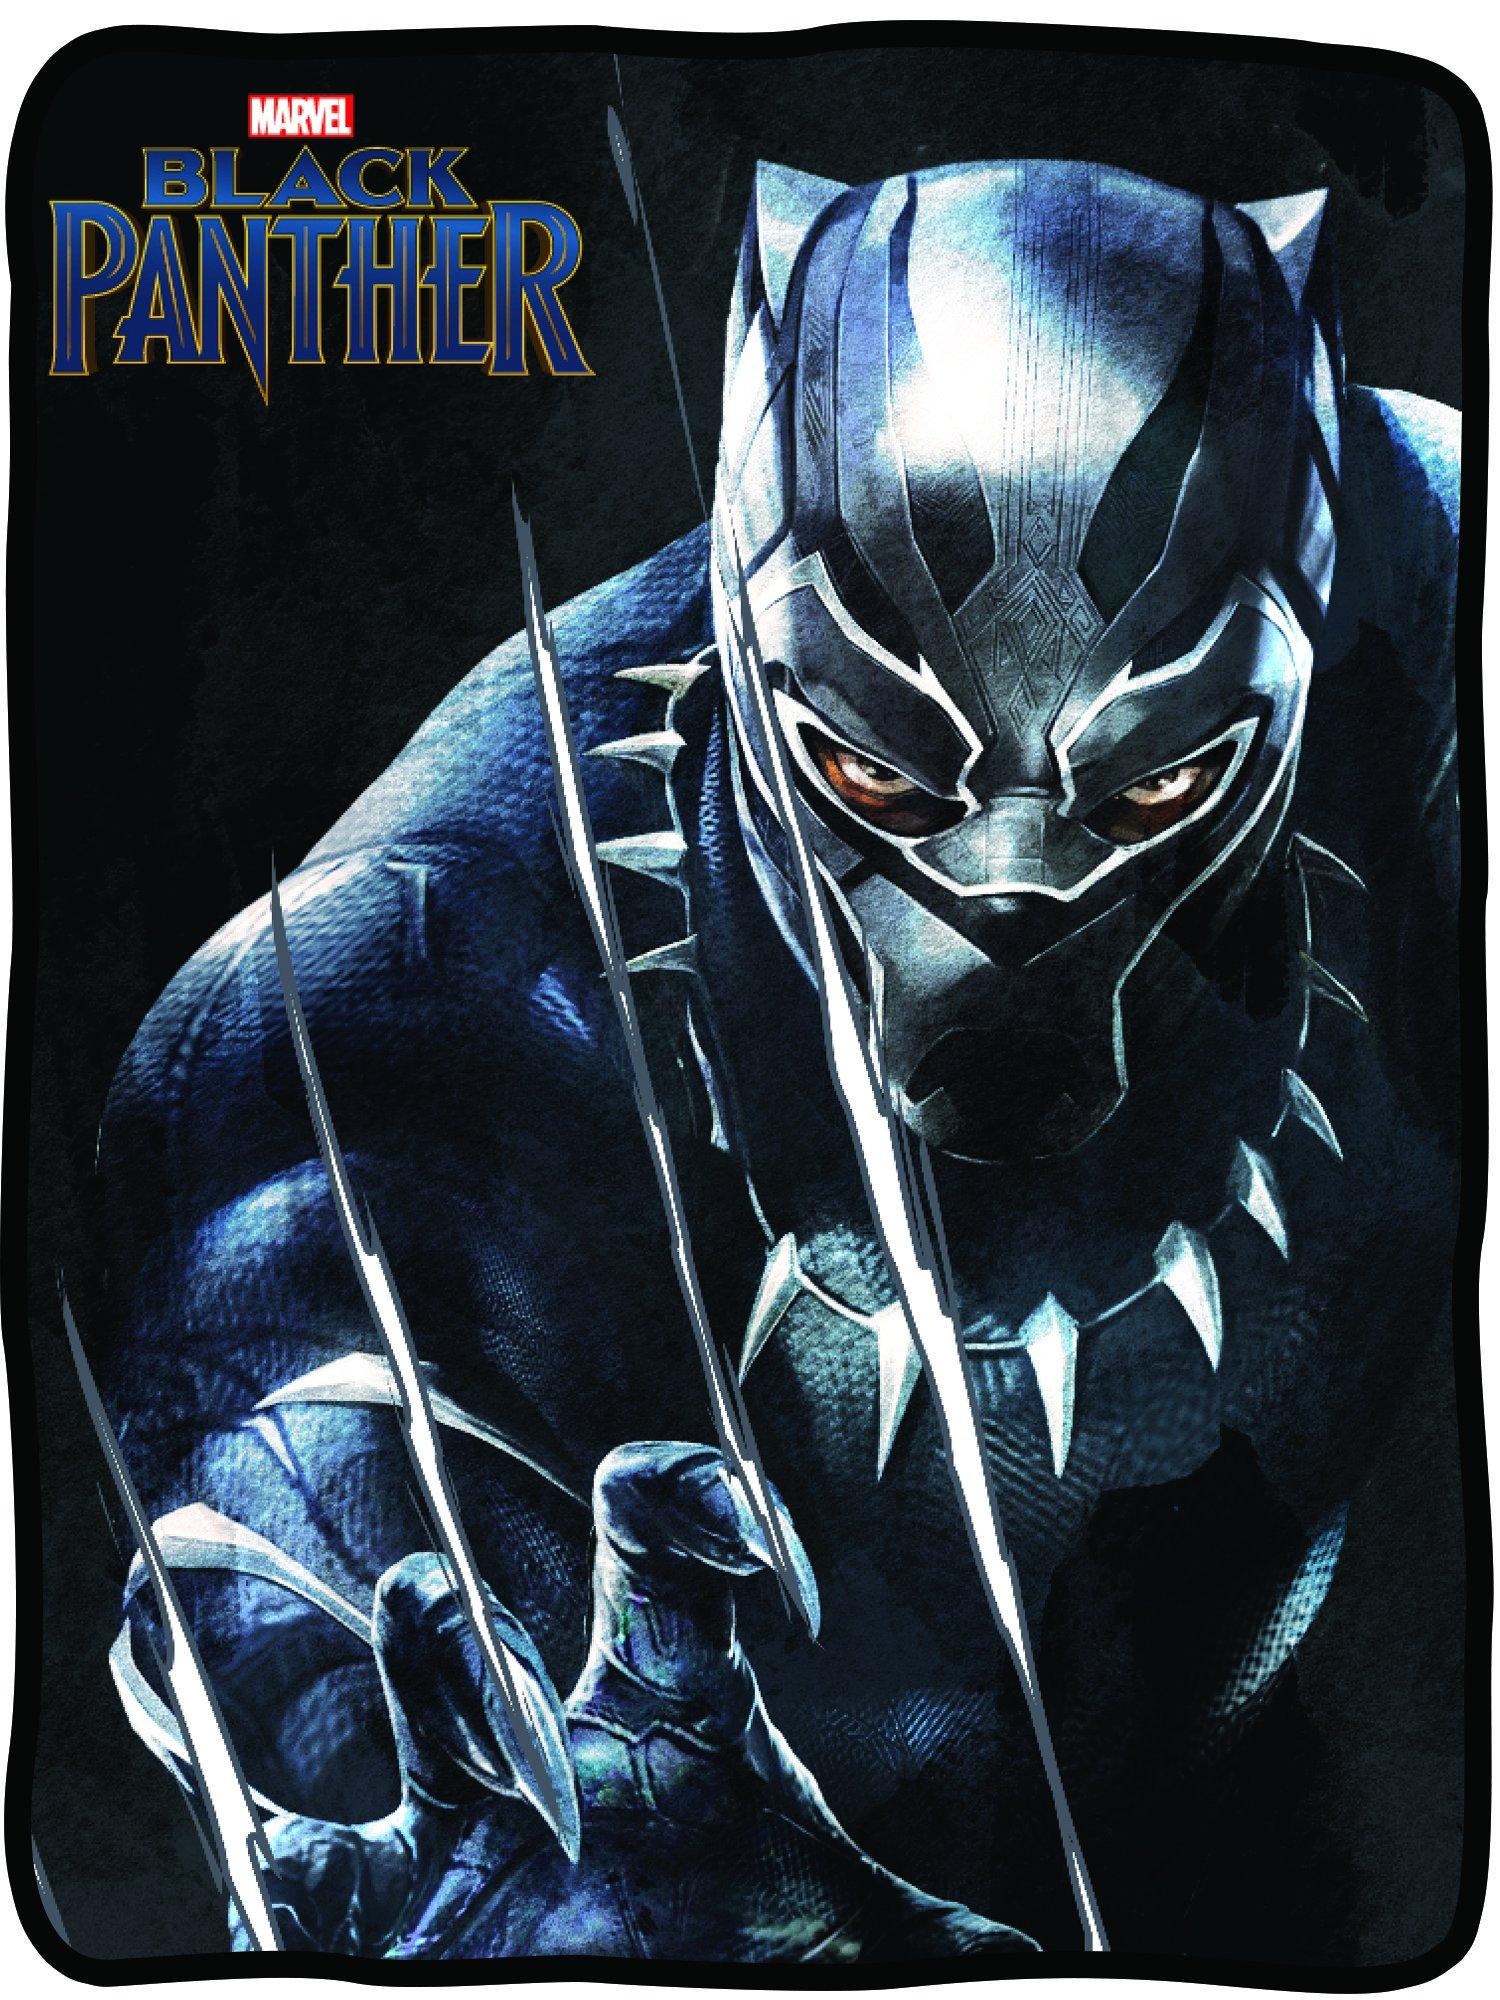 Marvel Black Panther Fleece Blanket - Officially Licensed Marvel Black Panther Movie Soft Silk Throw Bed Blanket by Marvel